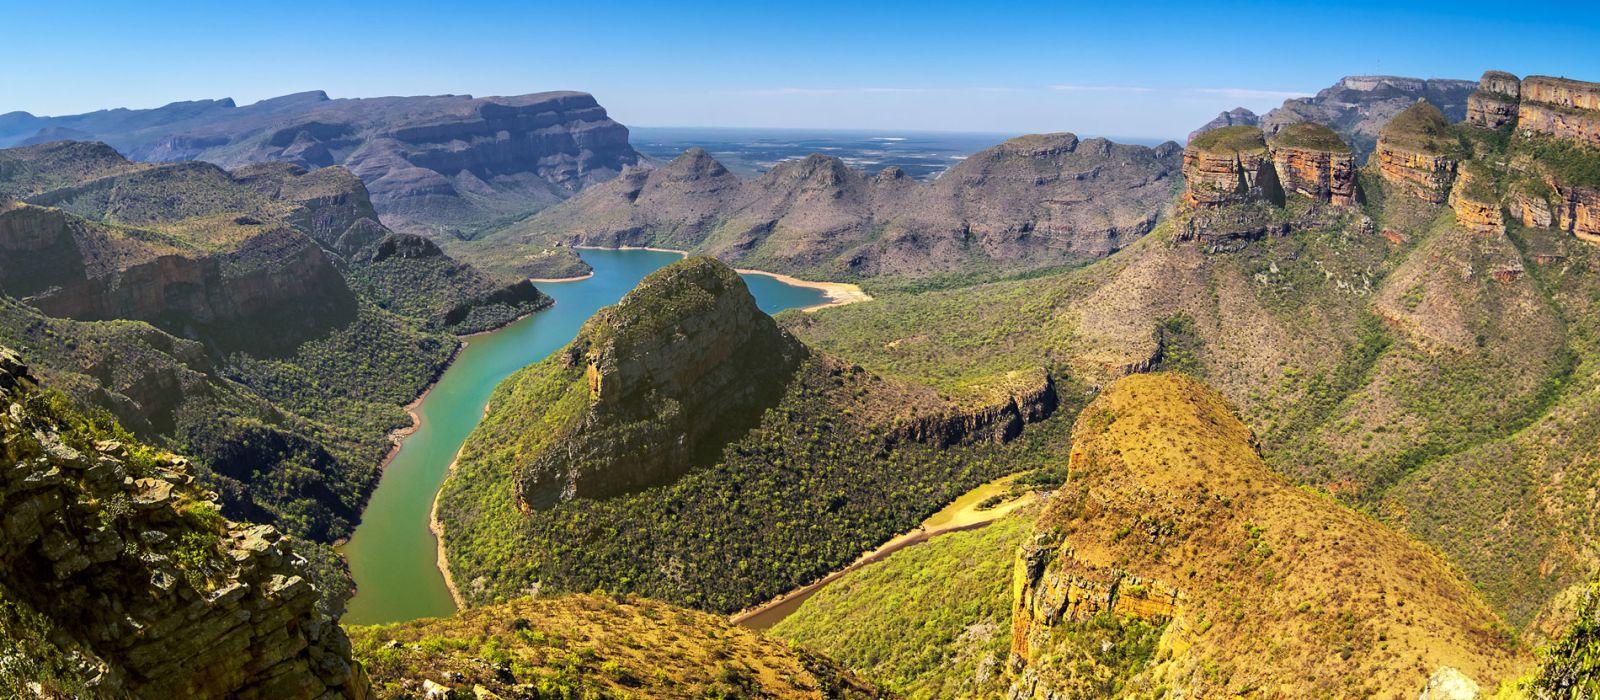 Destination Mpumalanga Province South Africa